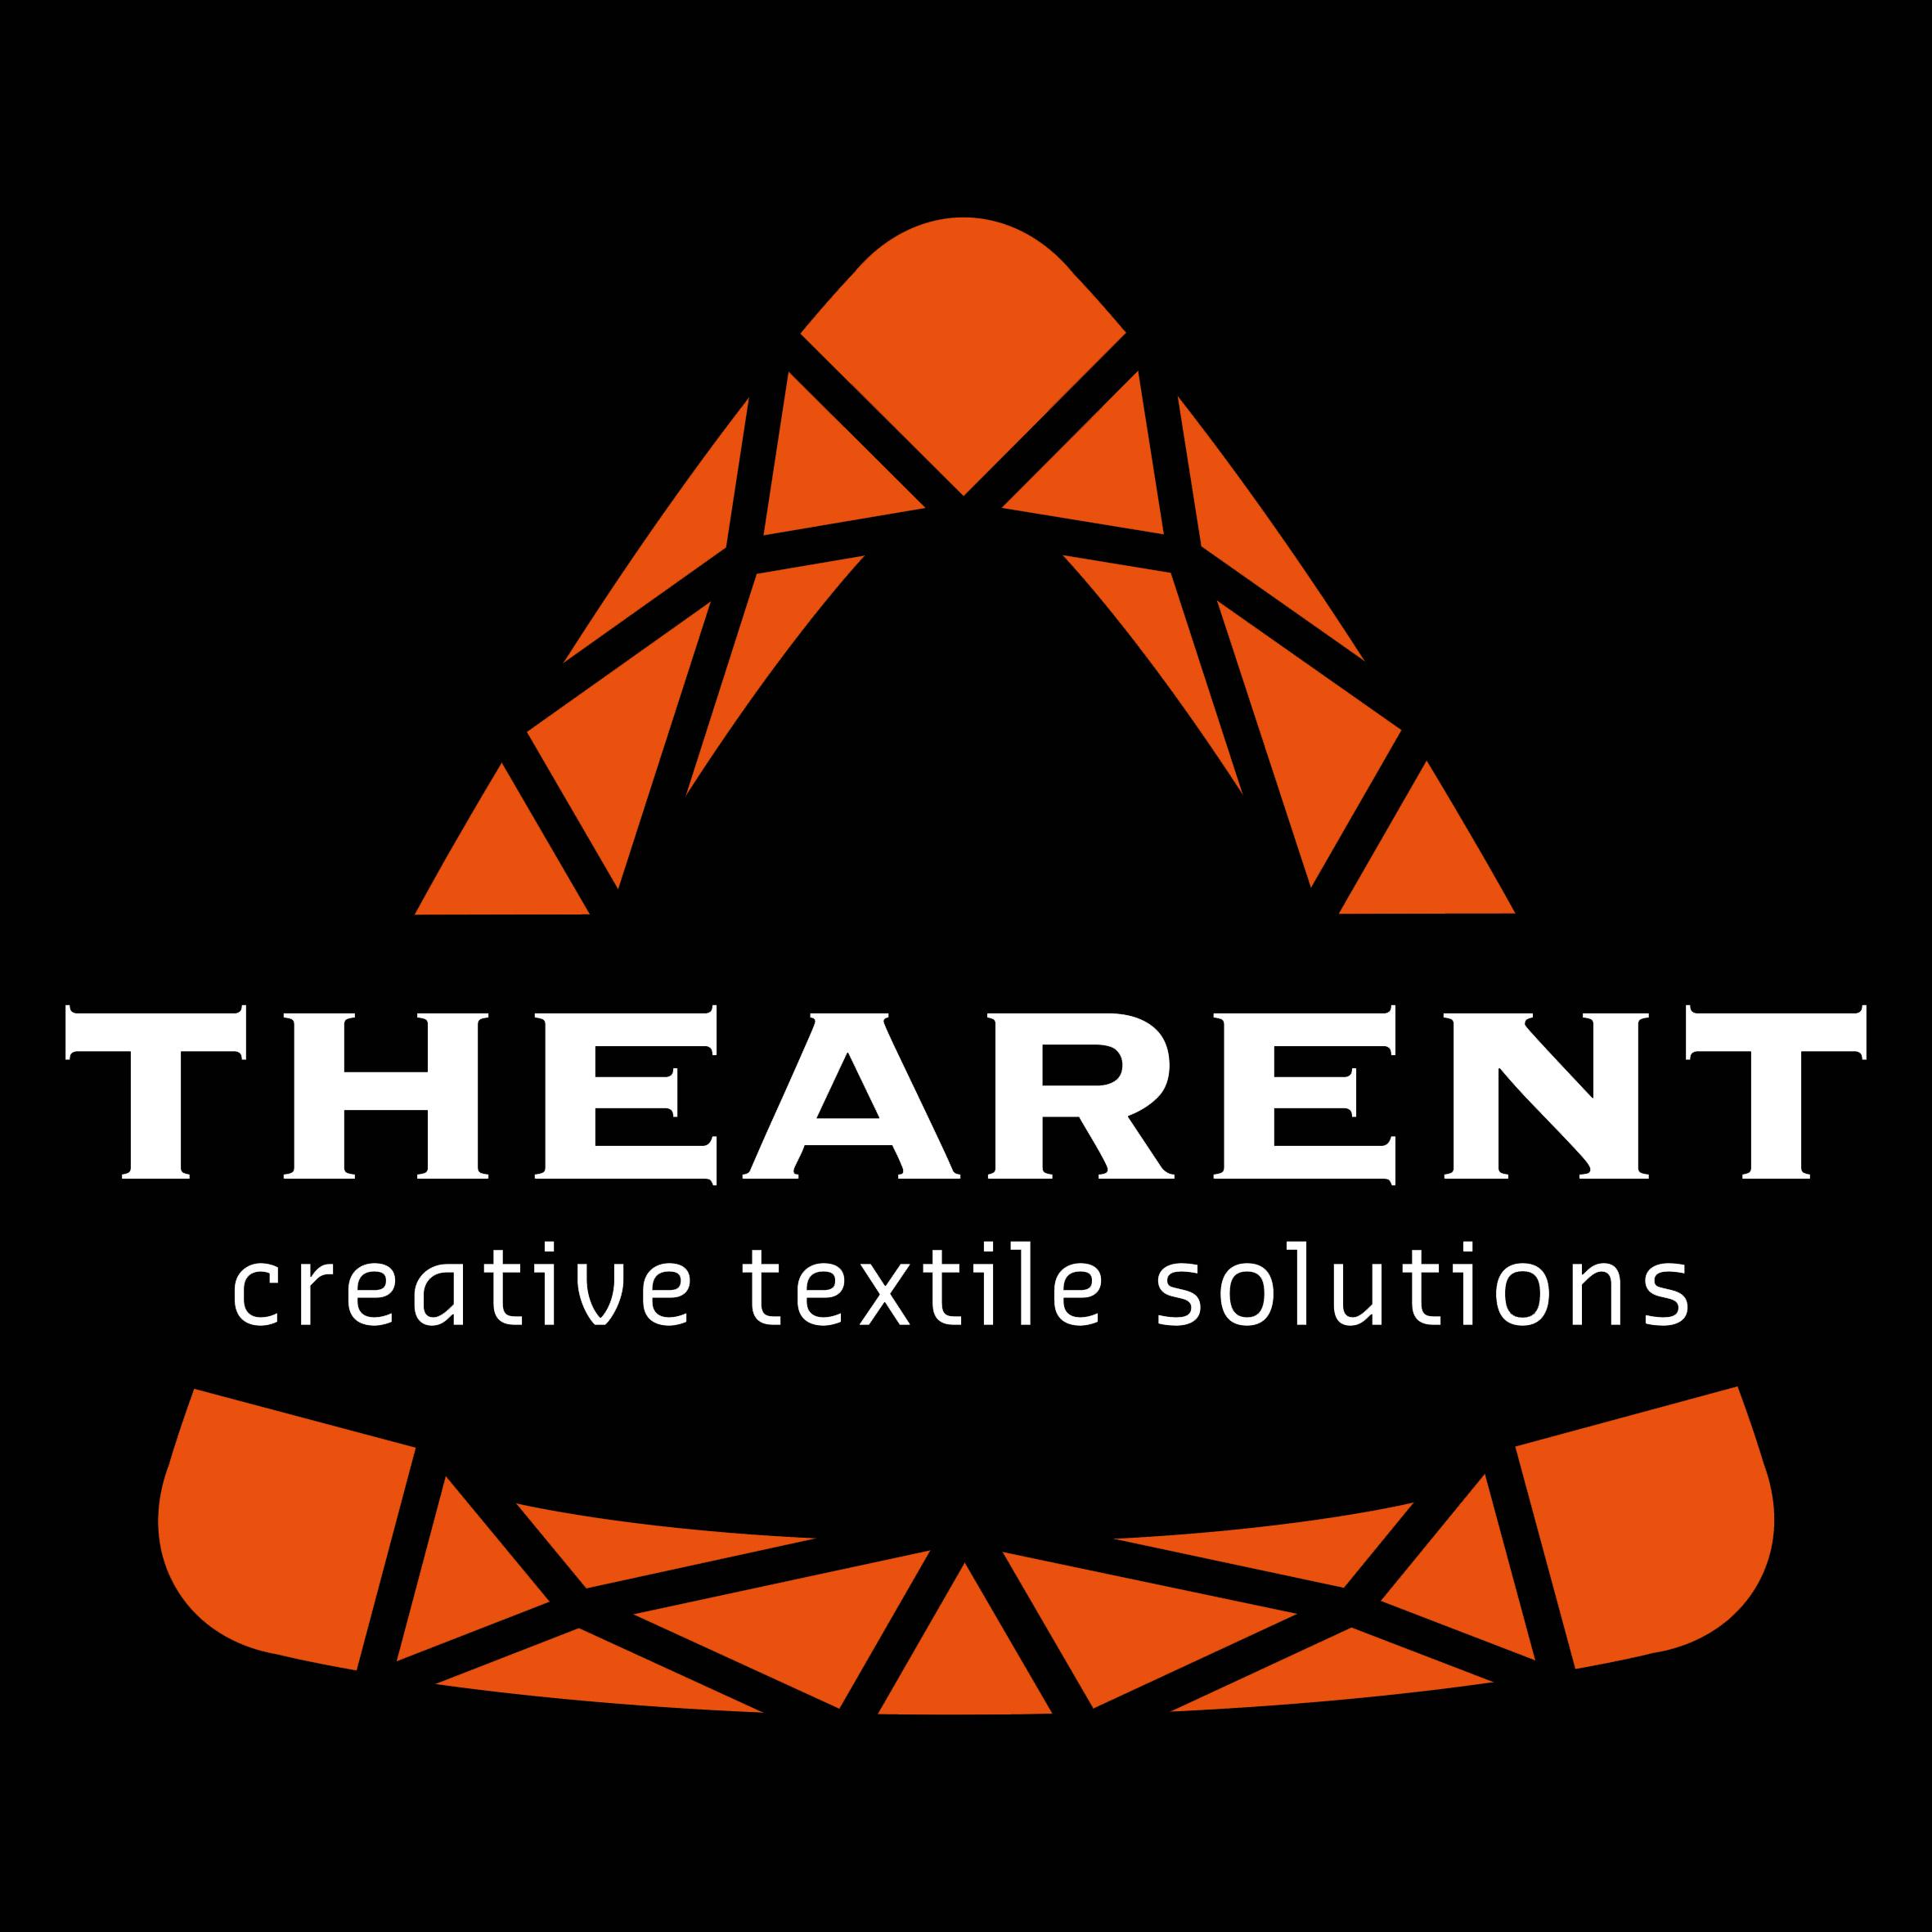 THEARENT Creative textile solutions